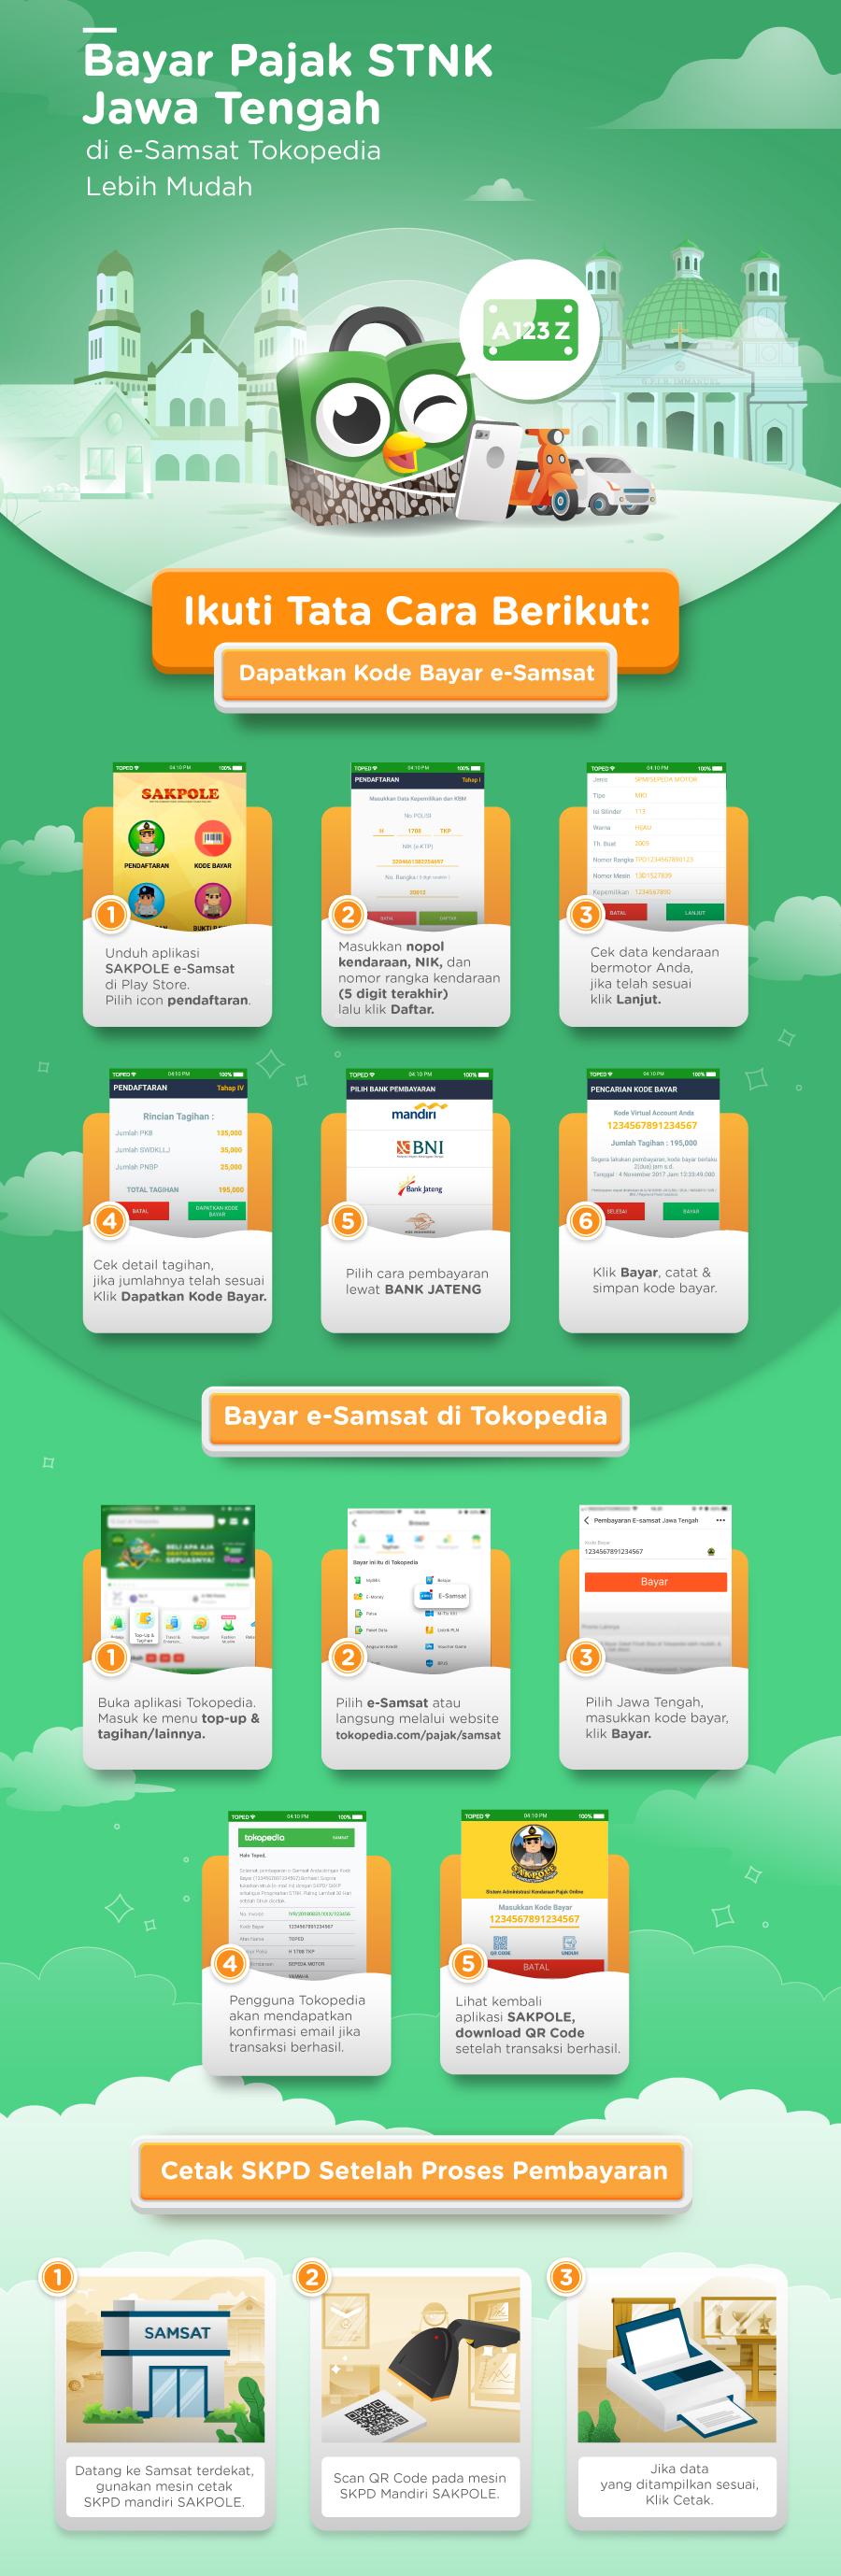 Alur Pembayaran E-Samsat Jawa Tengah Online di Tokopedia